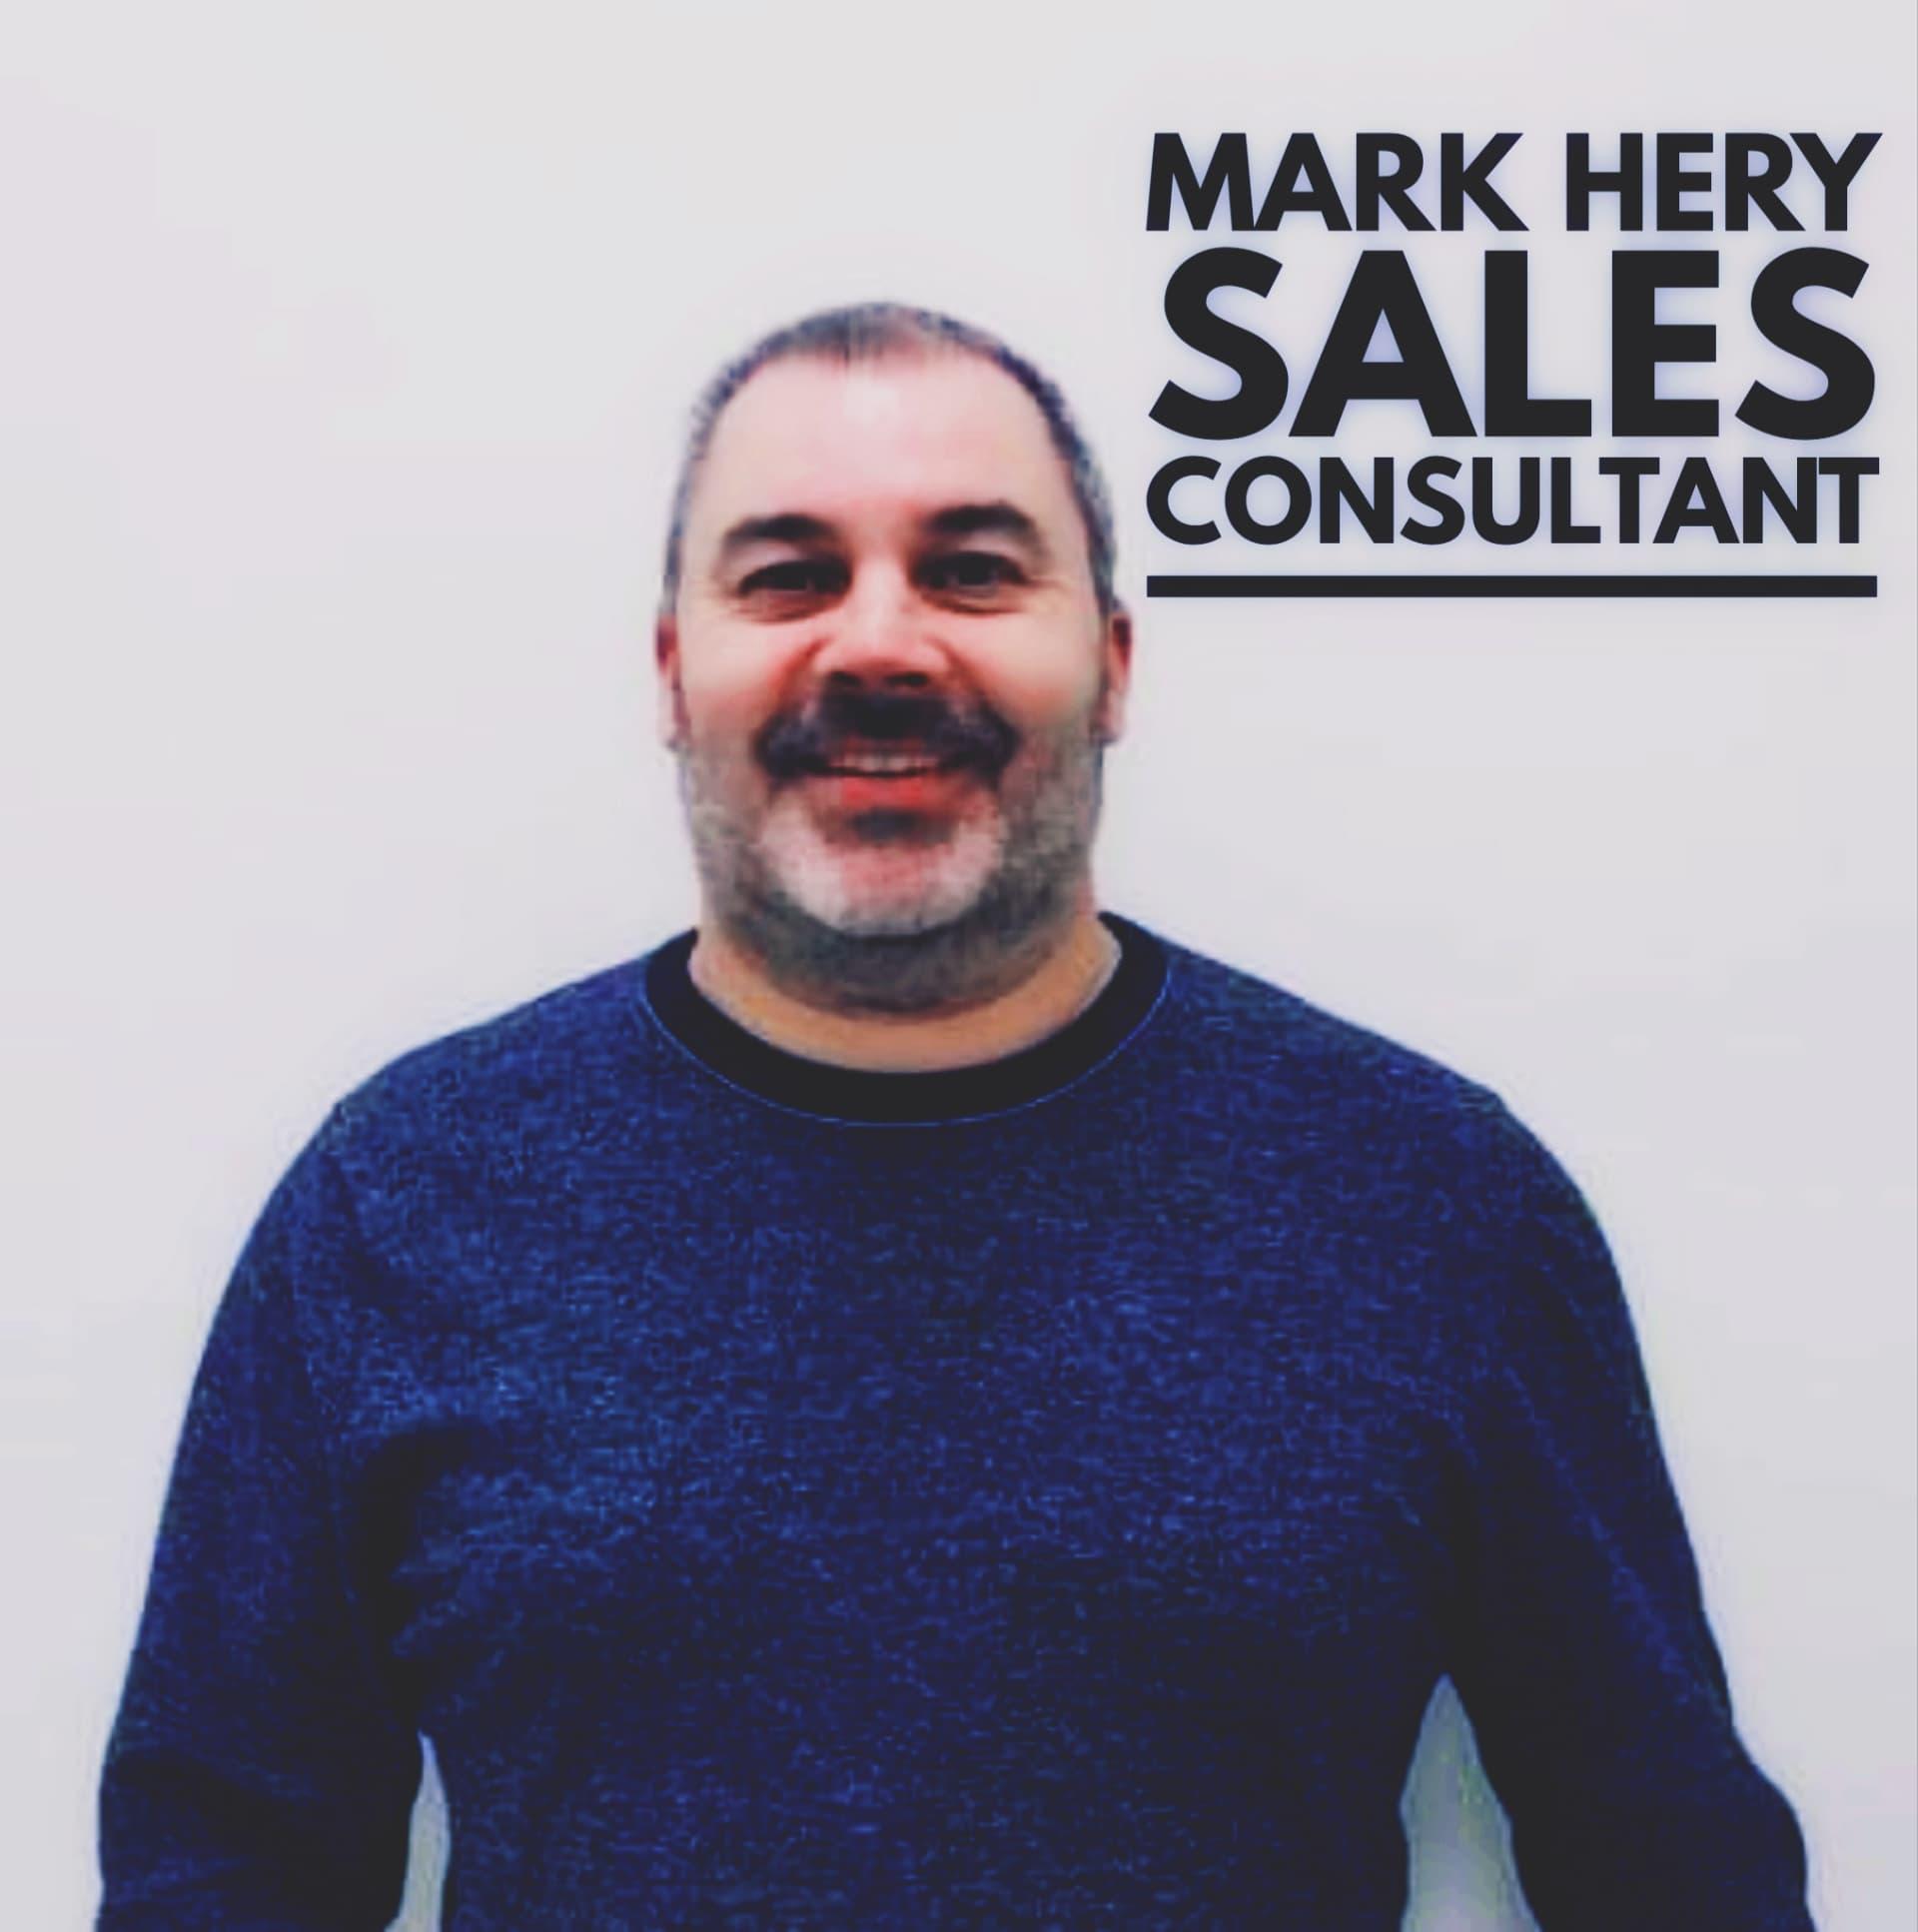 Mark Hery